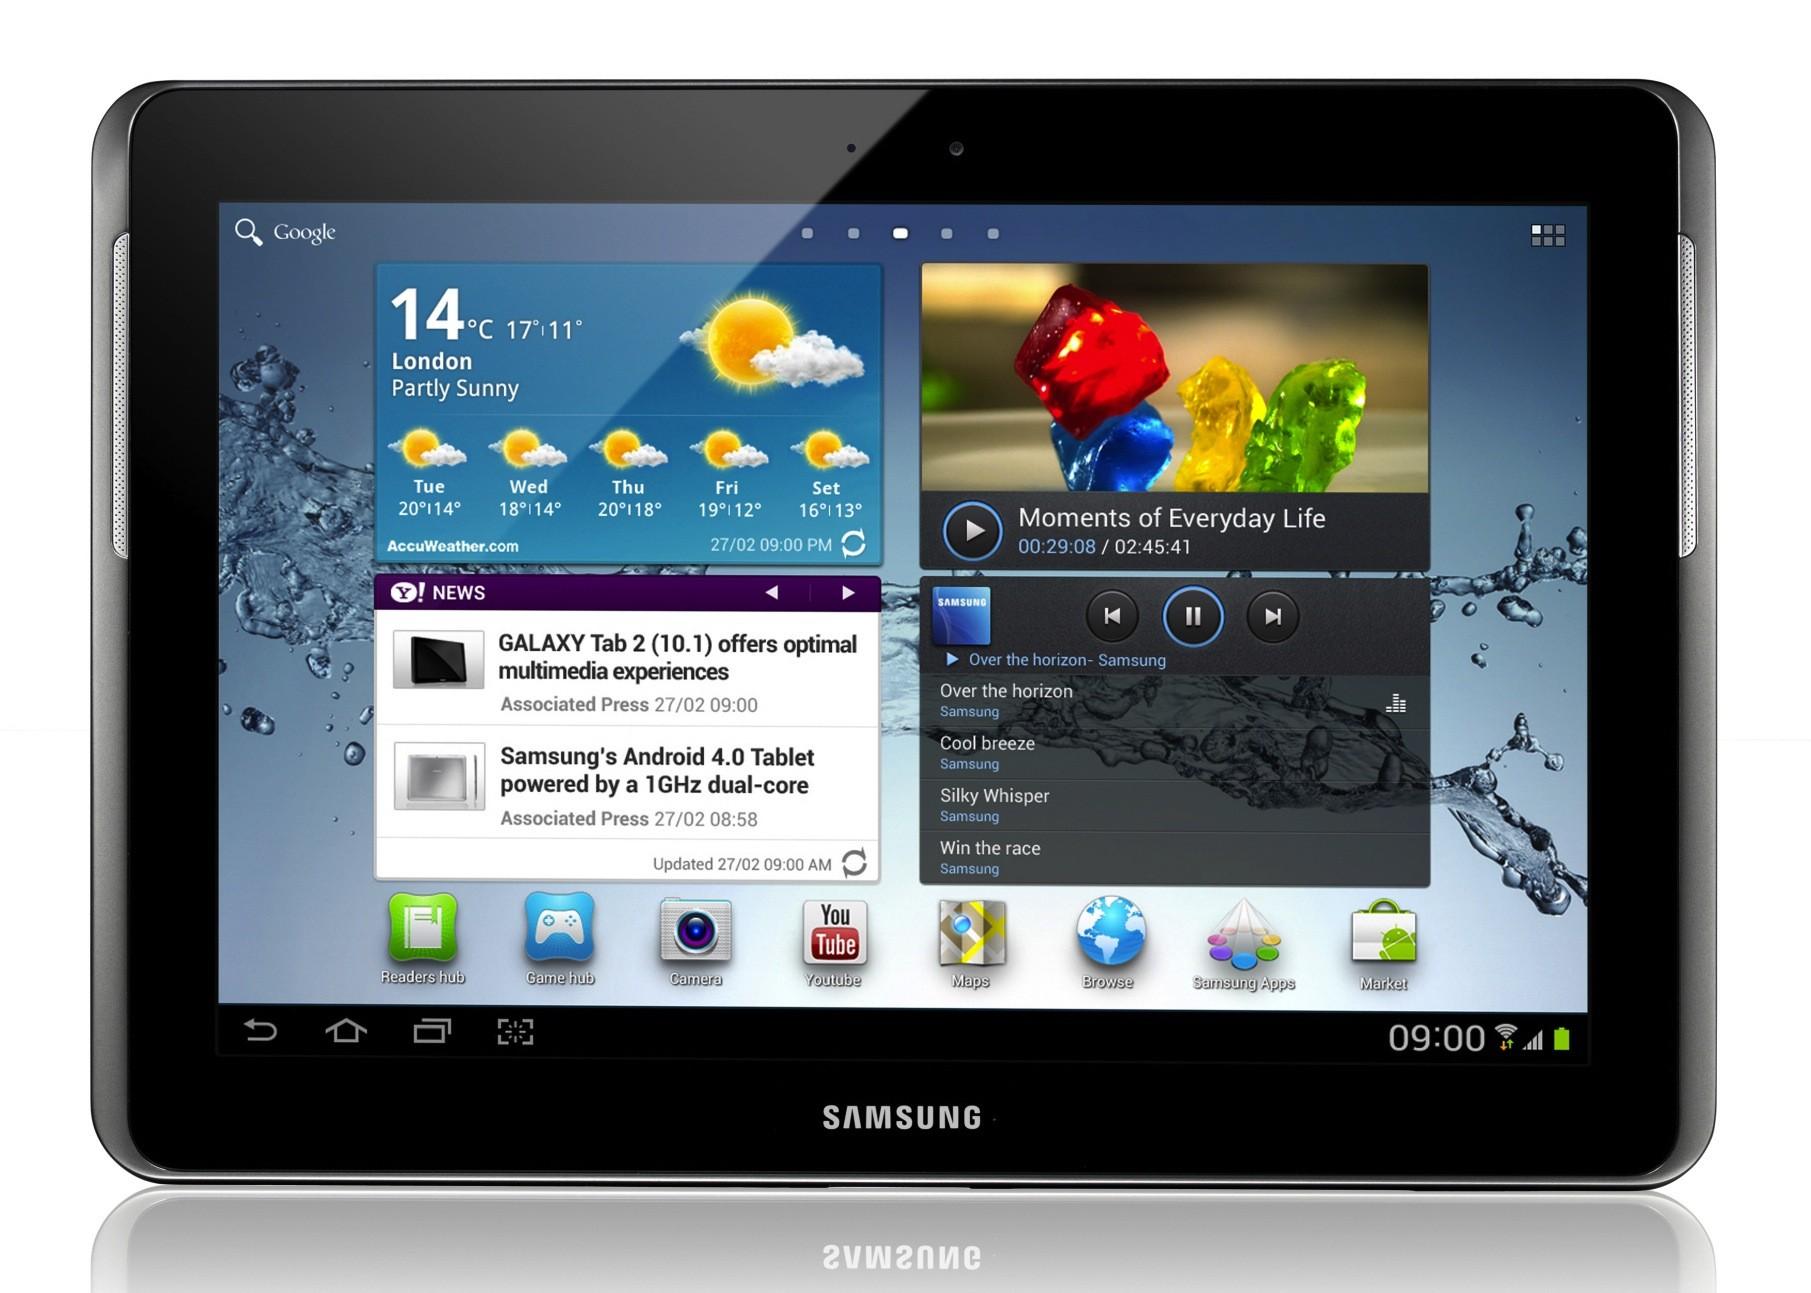 Samsung Galaxy Tab 2 10.1 (Wi-Fi + 3G) in offerta a 359€ da MarcoPolo (solo per oggi)